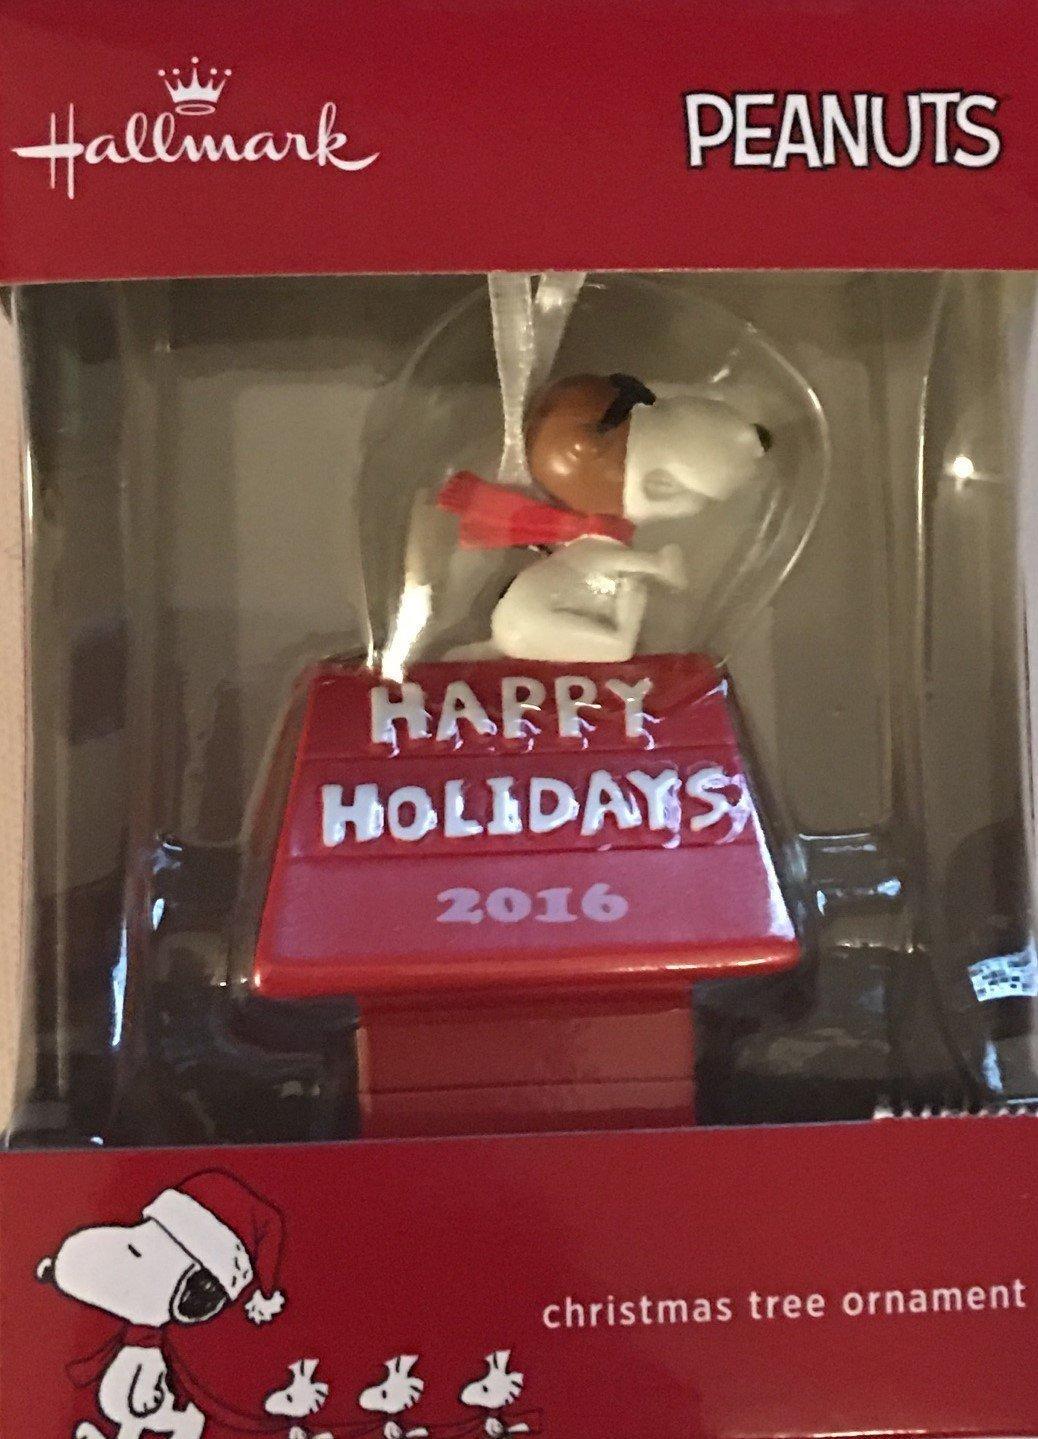 Peanuts Snoopy Happy Holidays 2016 Christmas Ornament